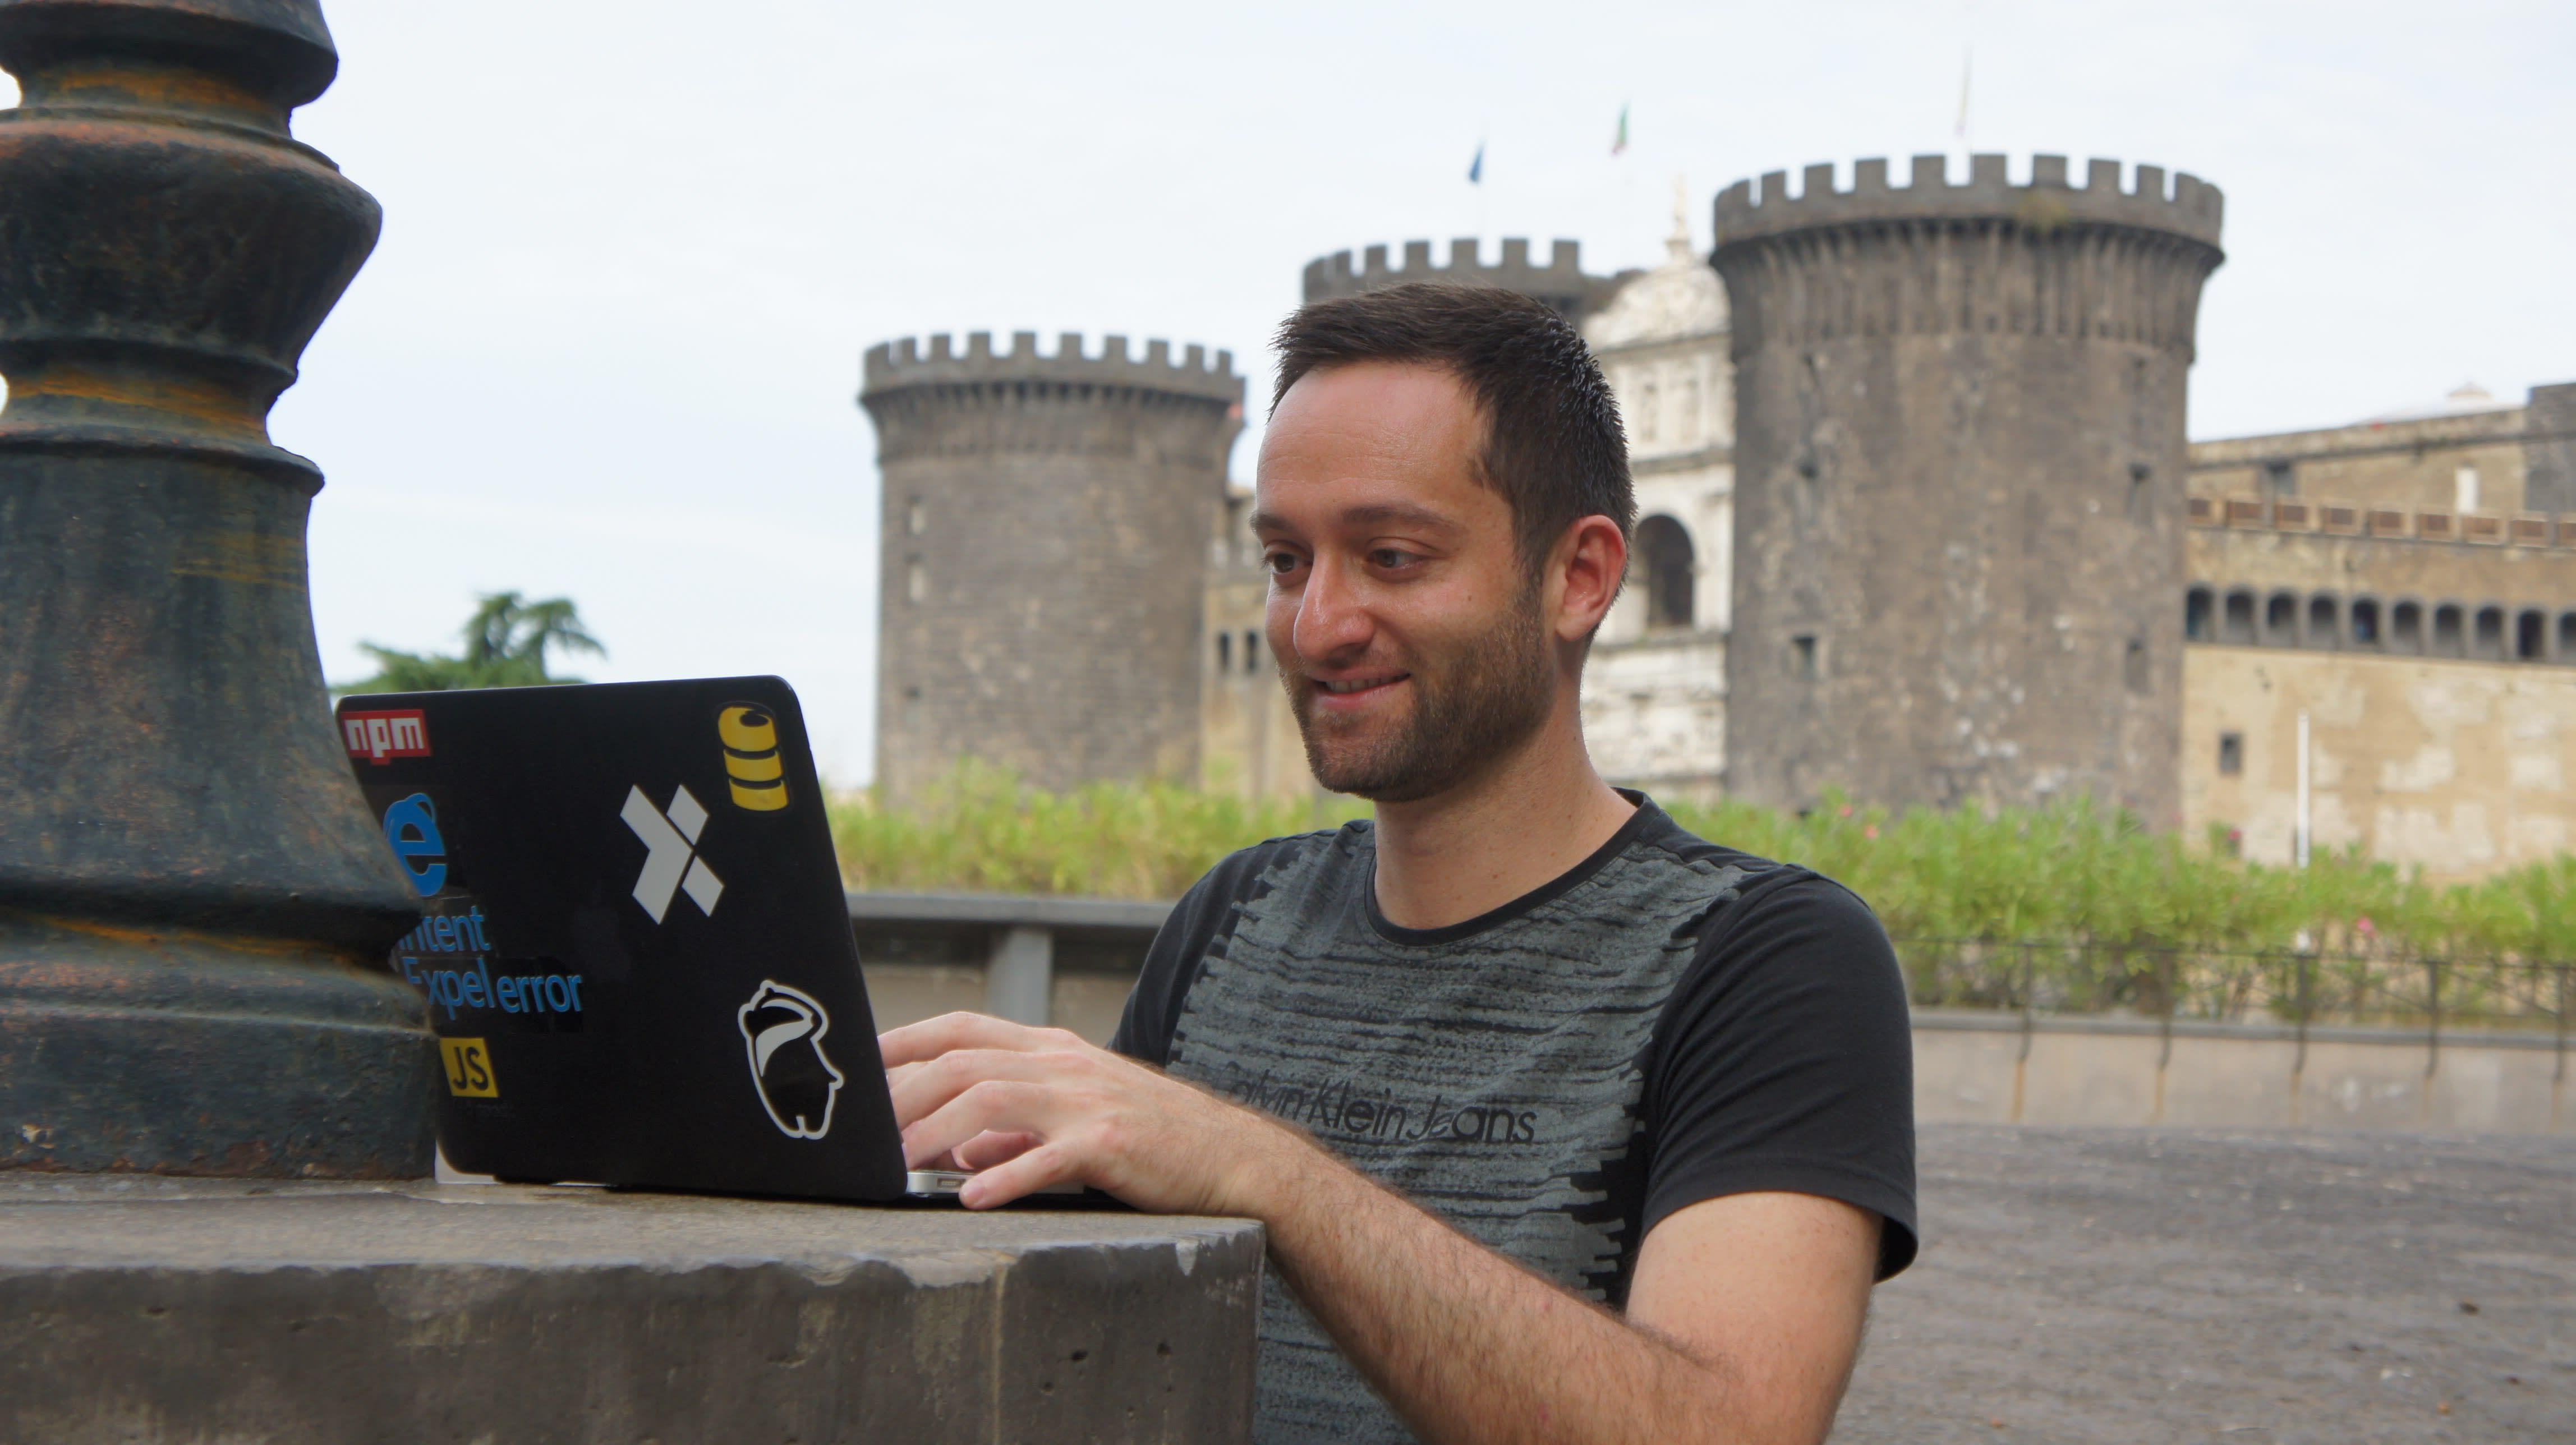 laptop near a castle